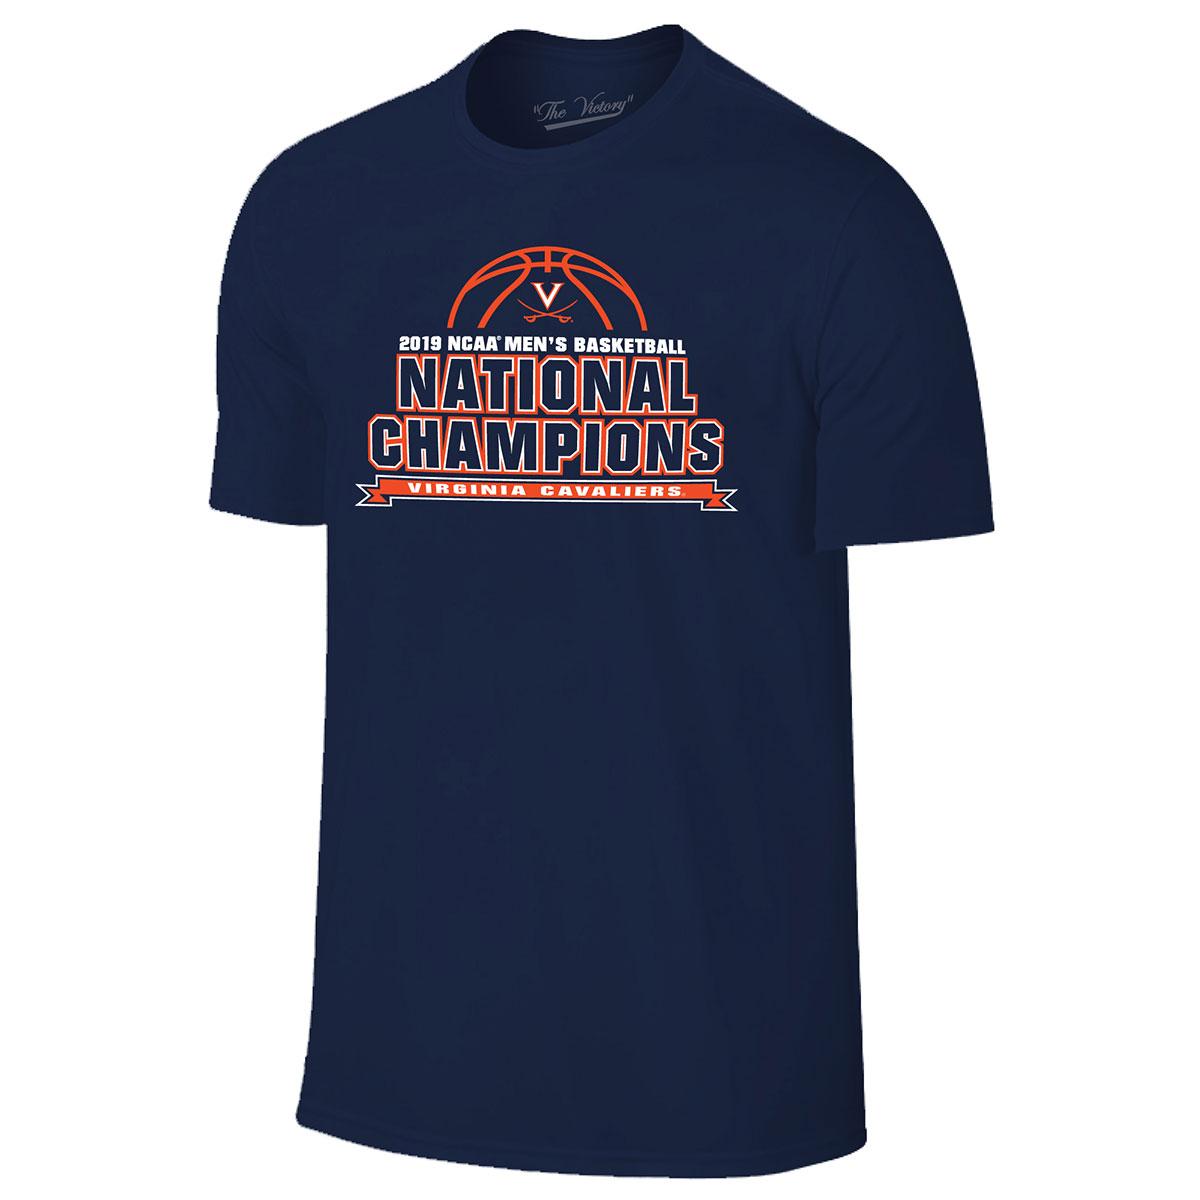 2019 National Champions Bracket T-shirt - Navy